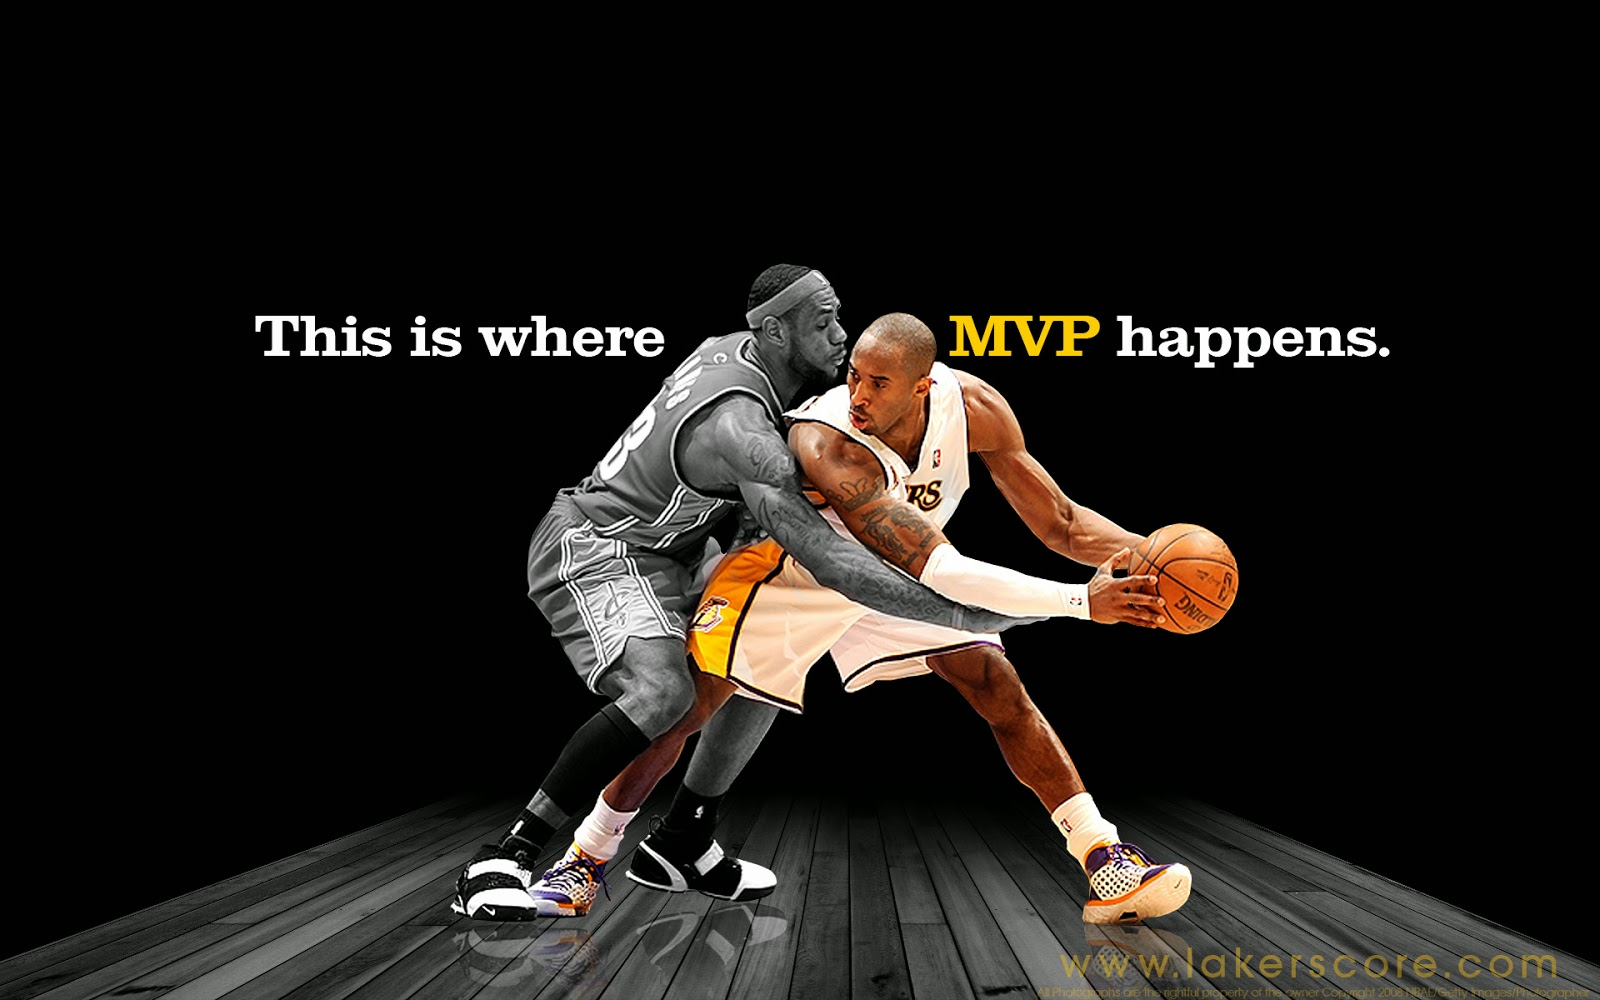 Wallpapers Kobe Bryant HD NBA   Fondos De pantallasWallpaper 1600x1000